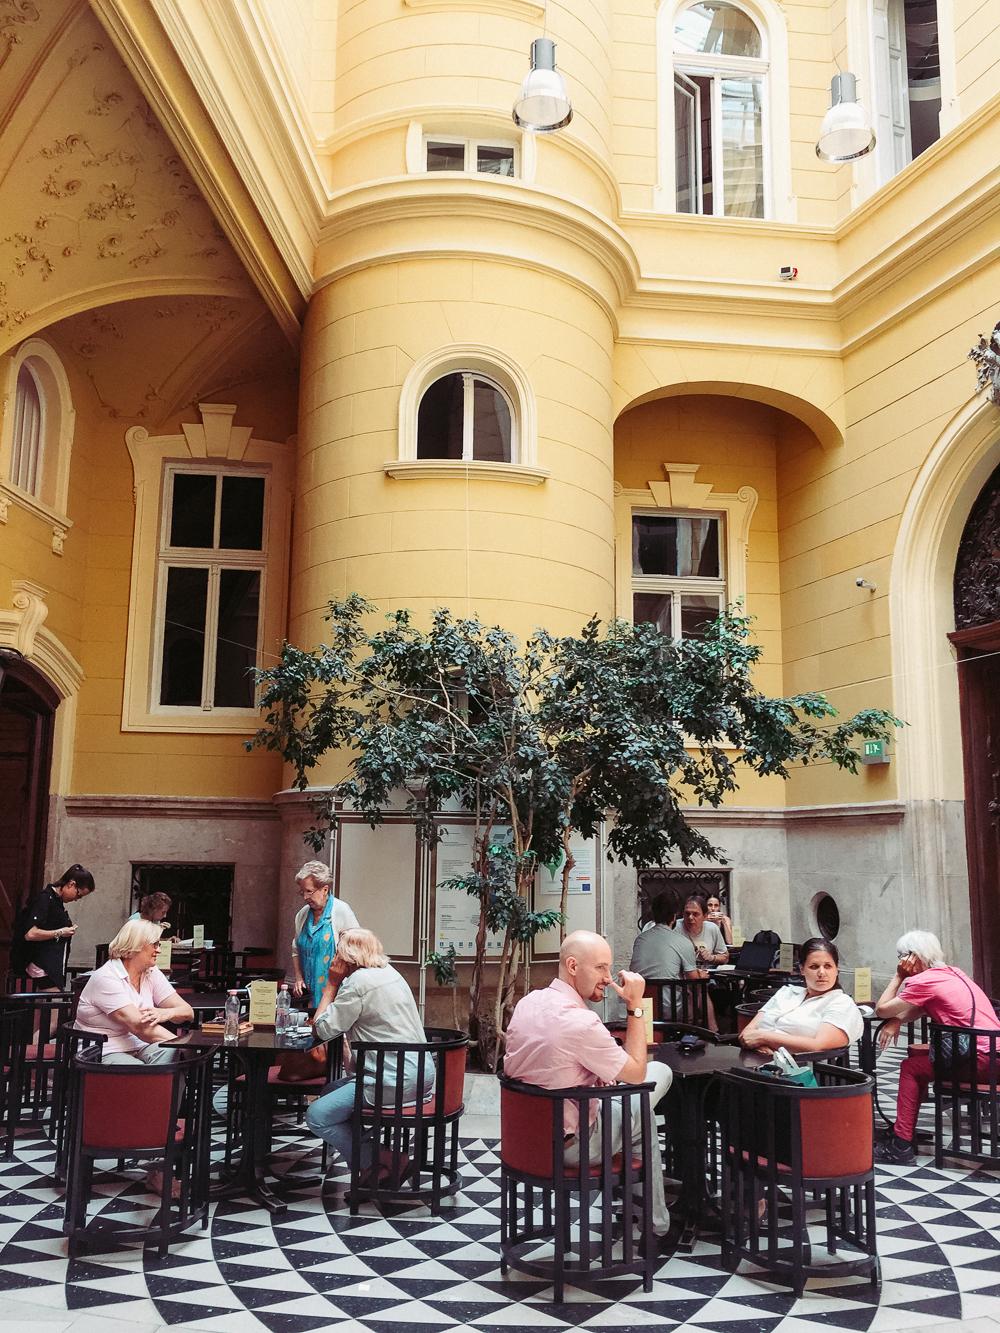 Metropolitan Ervin Szabó Library, Budapest, Hungary